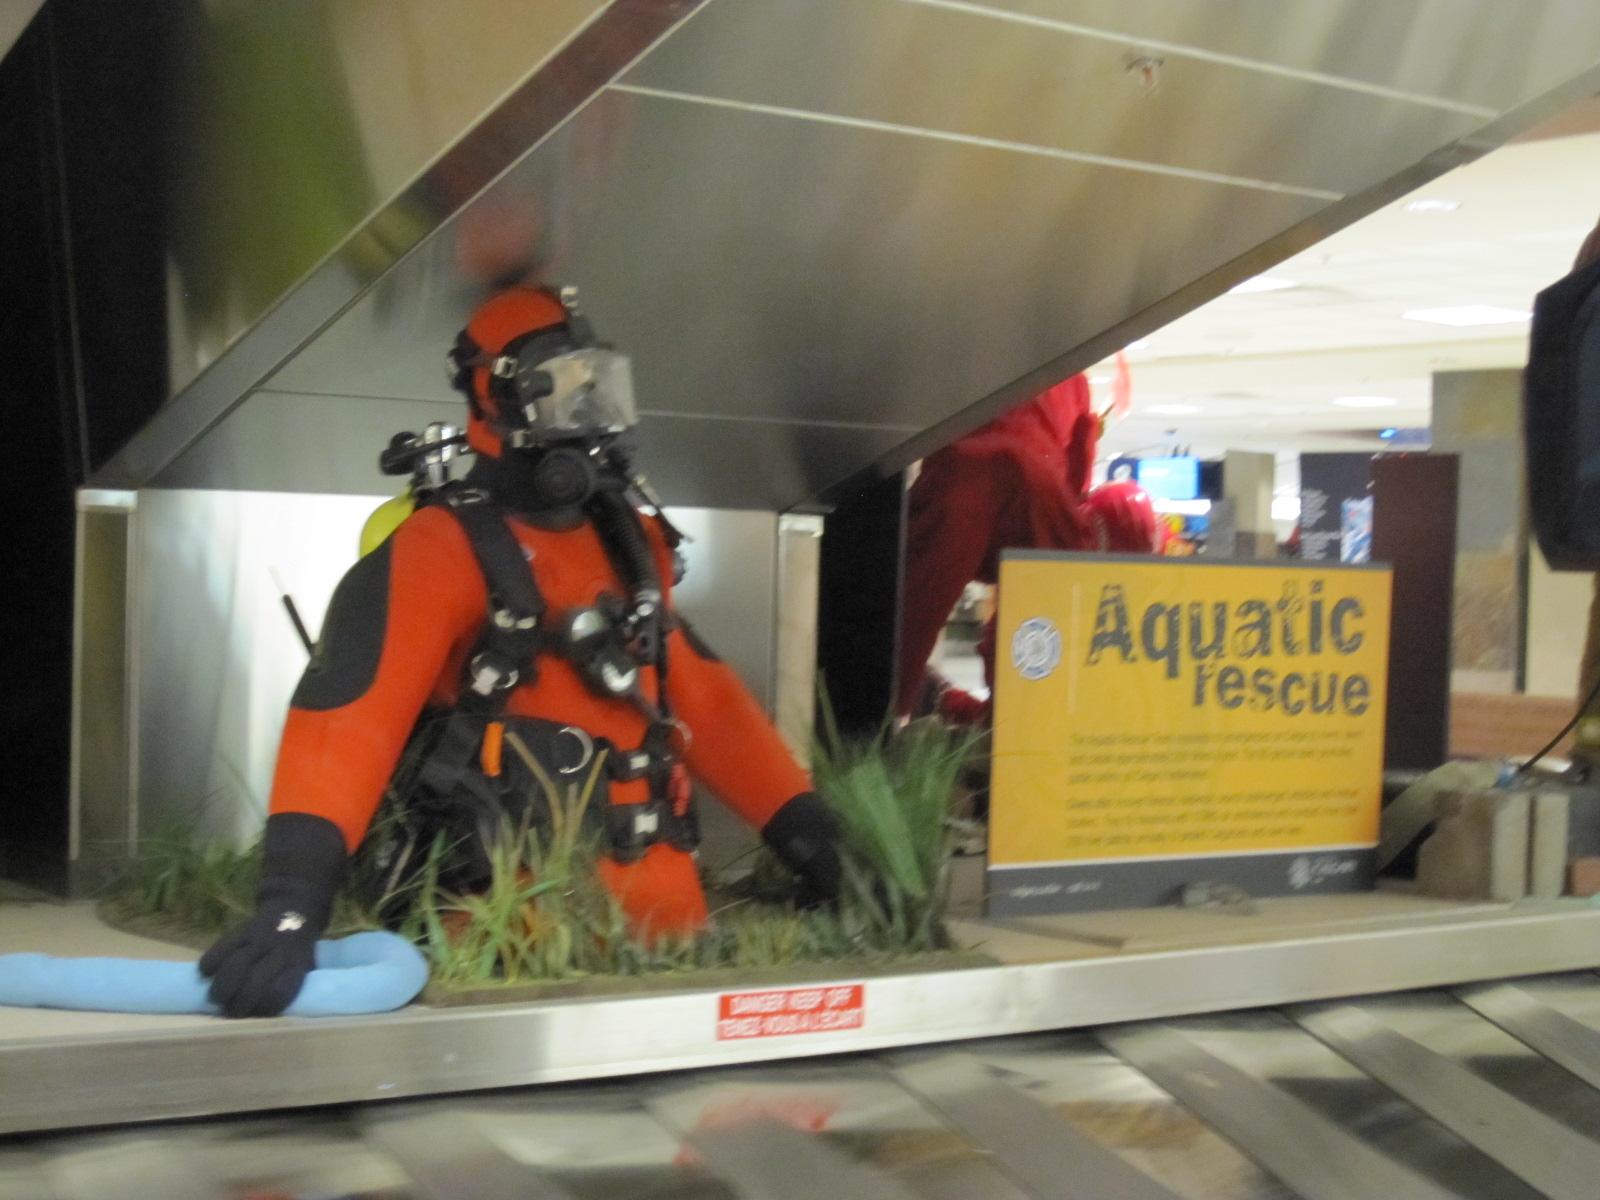 http://1.bp.blogspot.com/-XHDsrYTuiTg/TaILihGox1I/AAAAAAAAA4s/IrrMoPPwEpY/s1600/airport+aqua+rescue.JPG